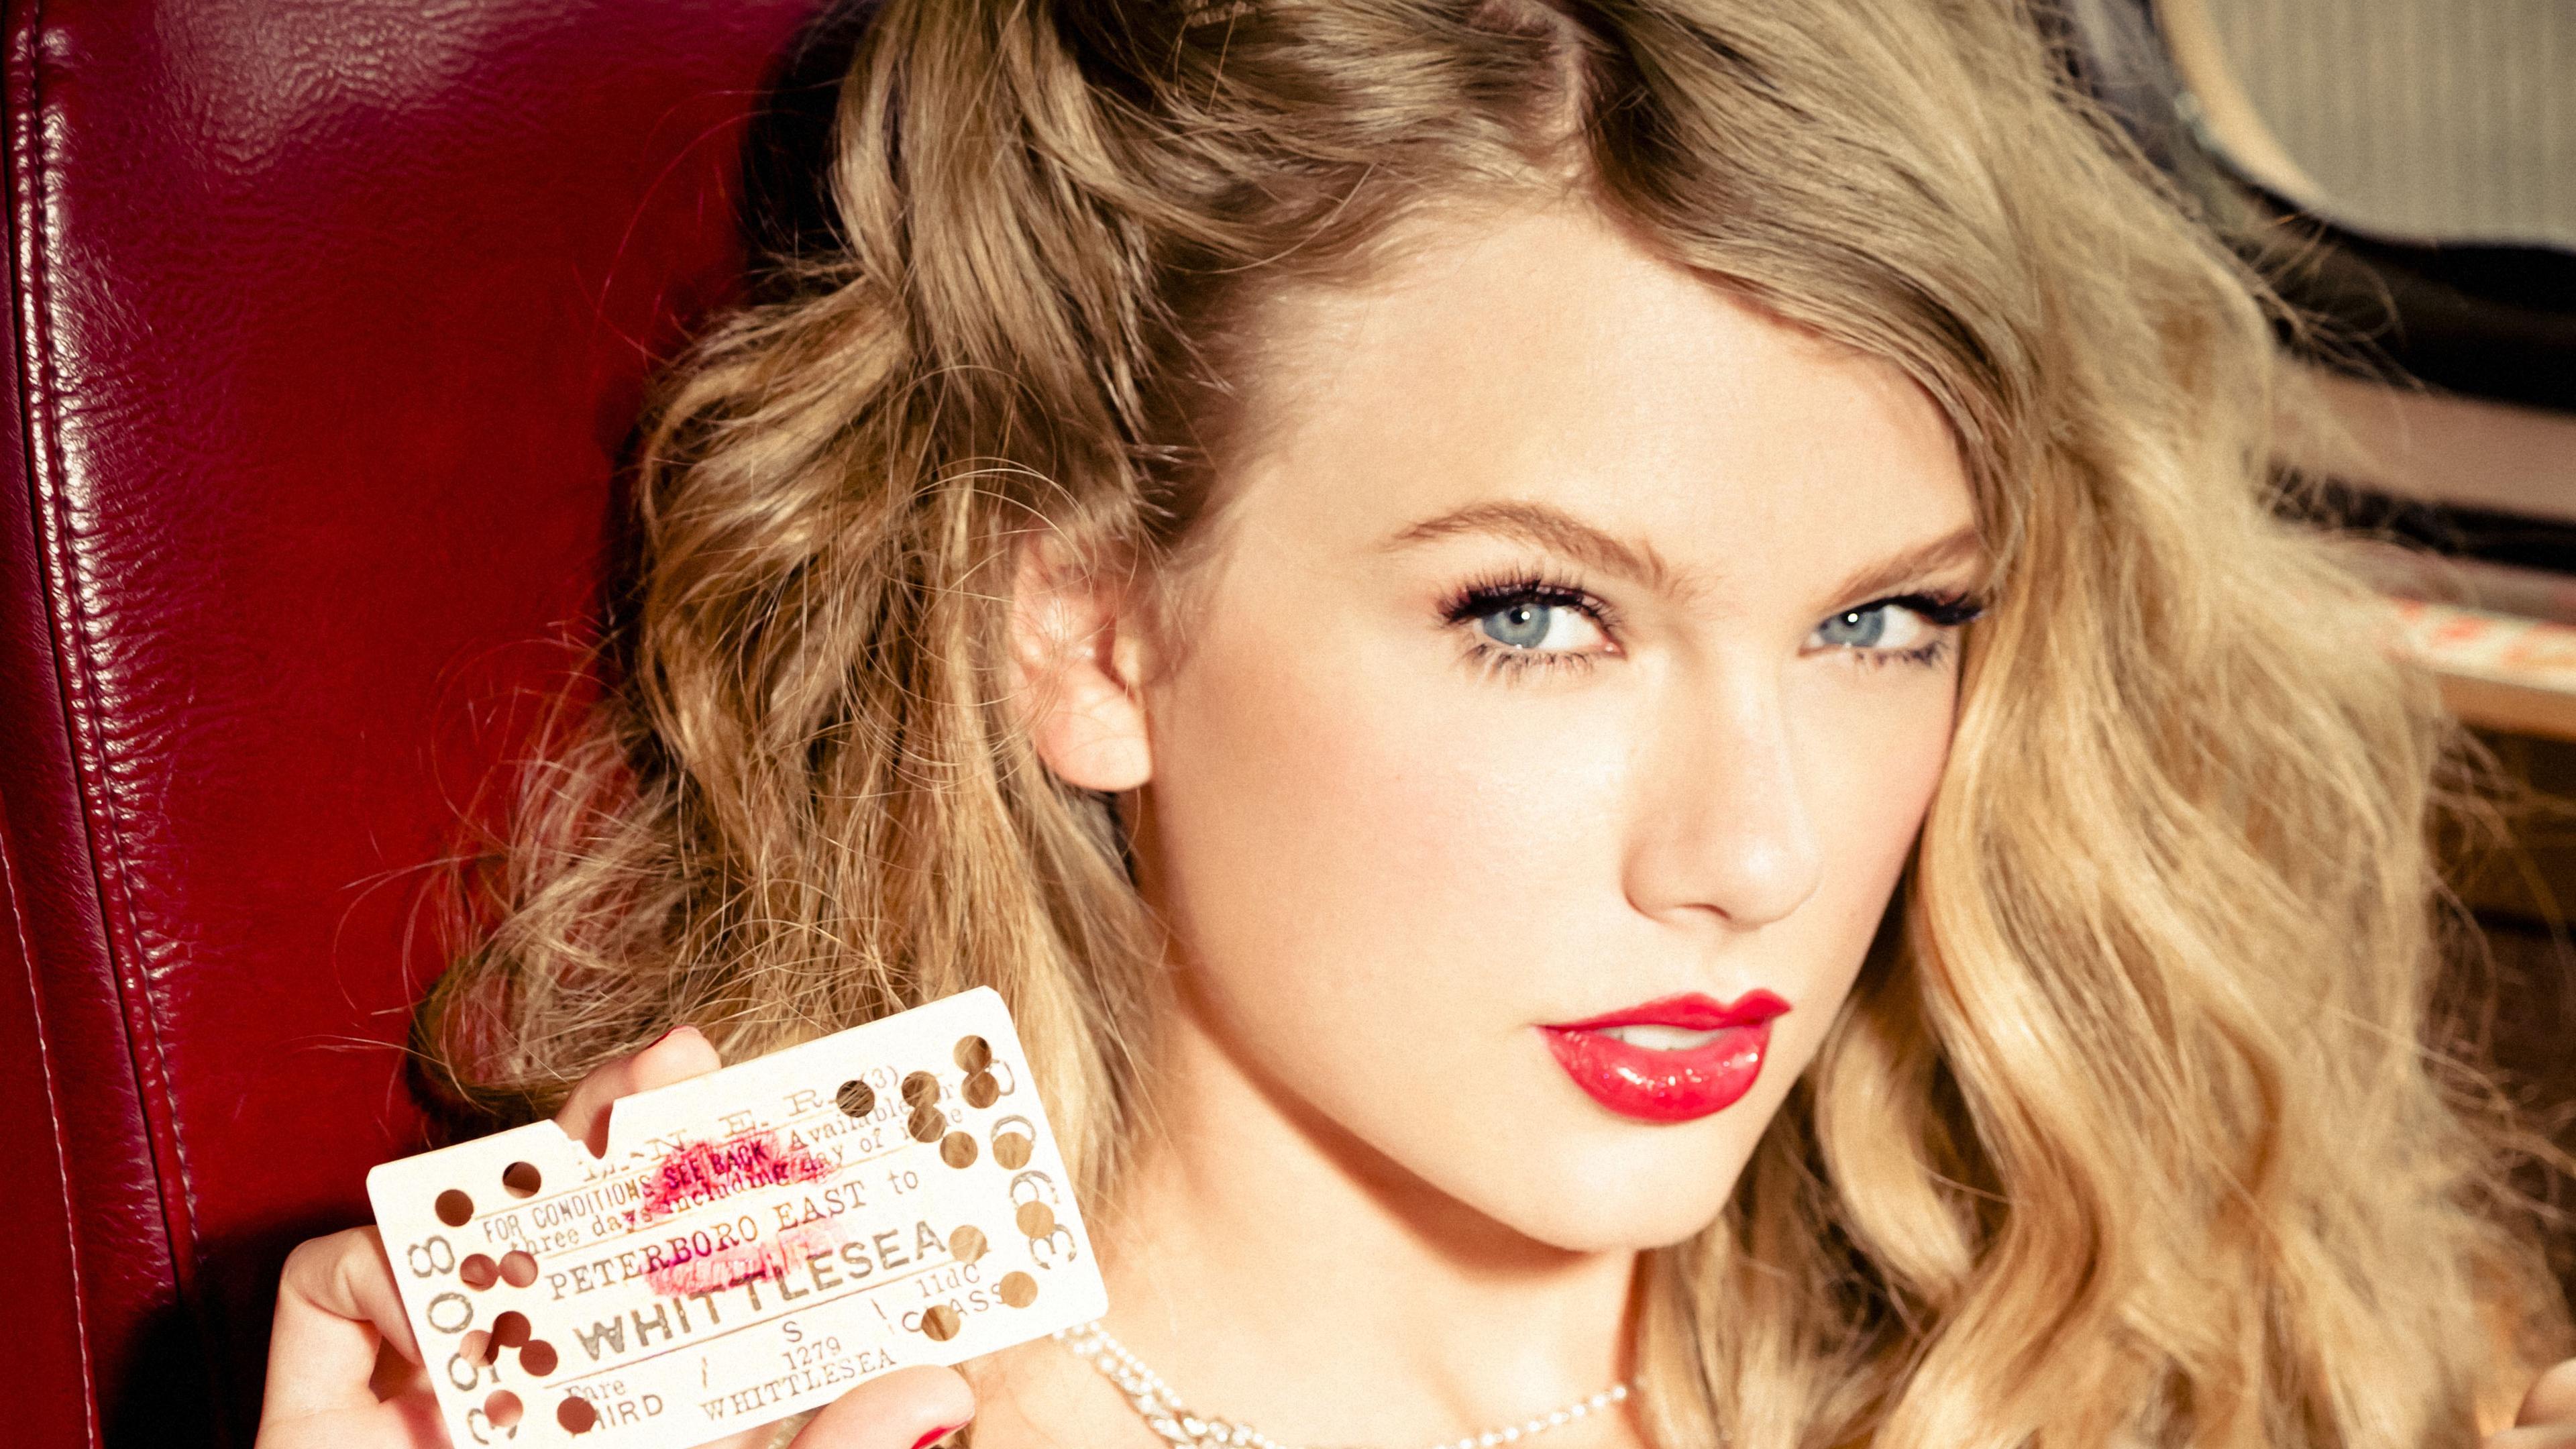 taylor swift 4k 2019 1546276803 - Taylor Swift 4k 2019 - taylor swift wallpapers, singer wallpapers, music wallpapers, hd-wallpapers, celebrities wallpapers, 4k-wallpapers